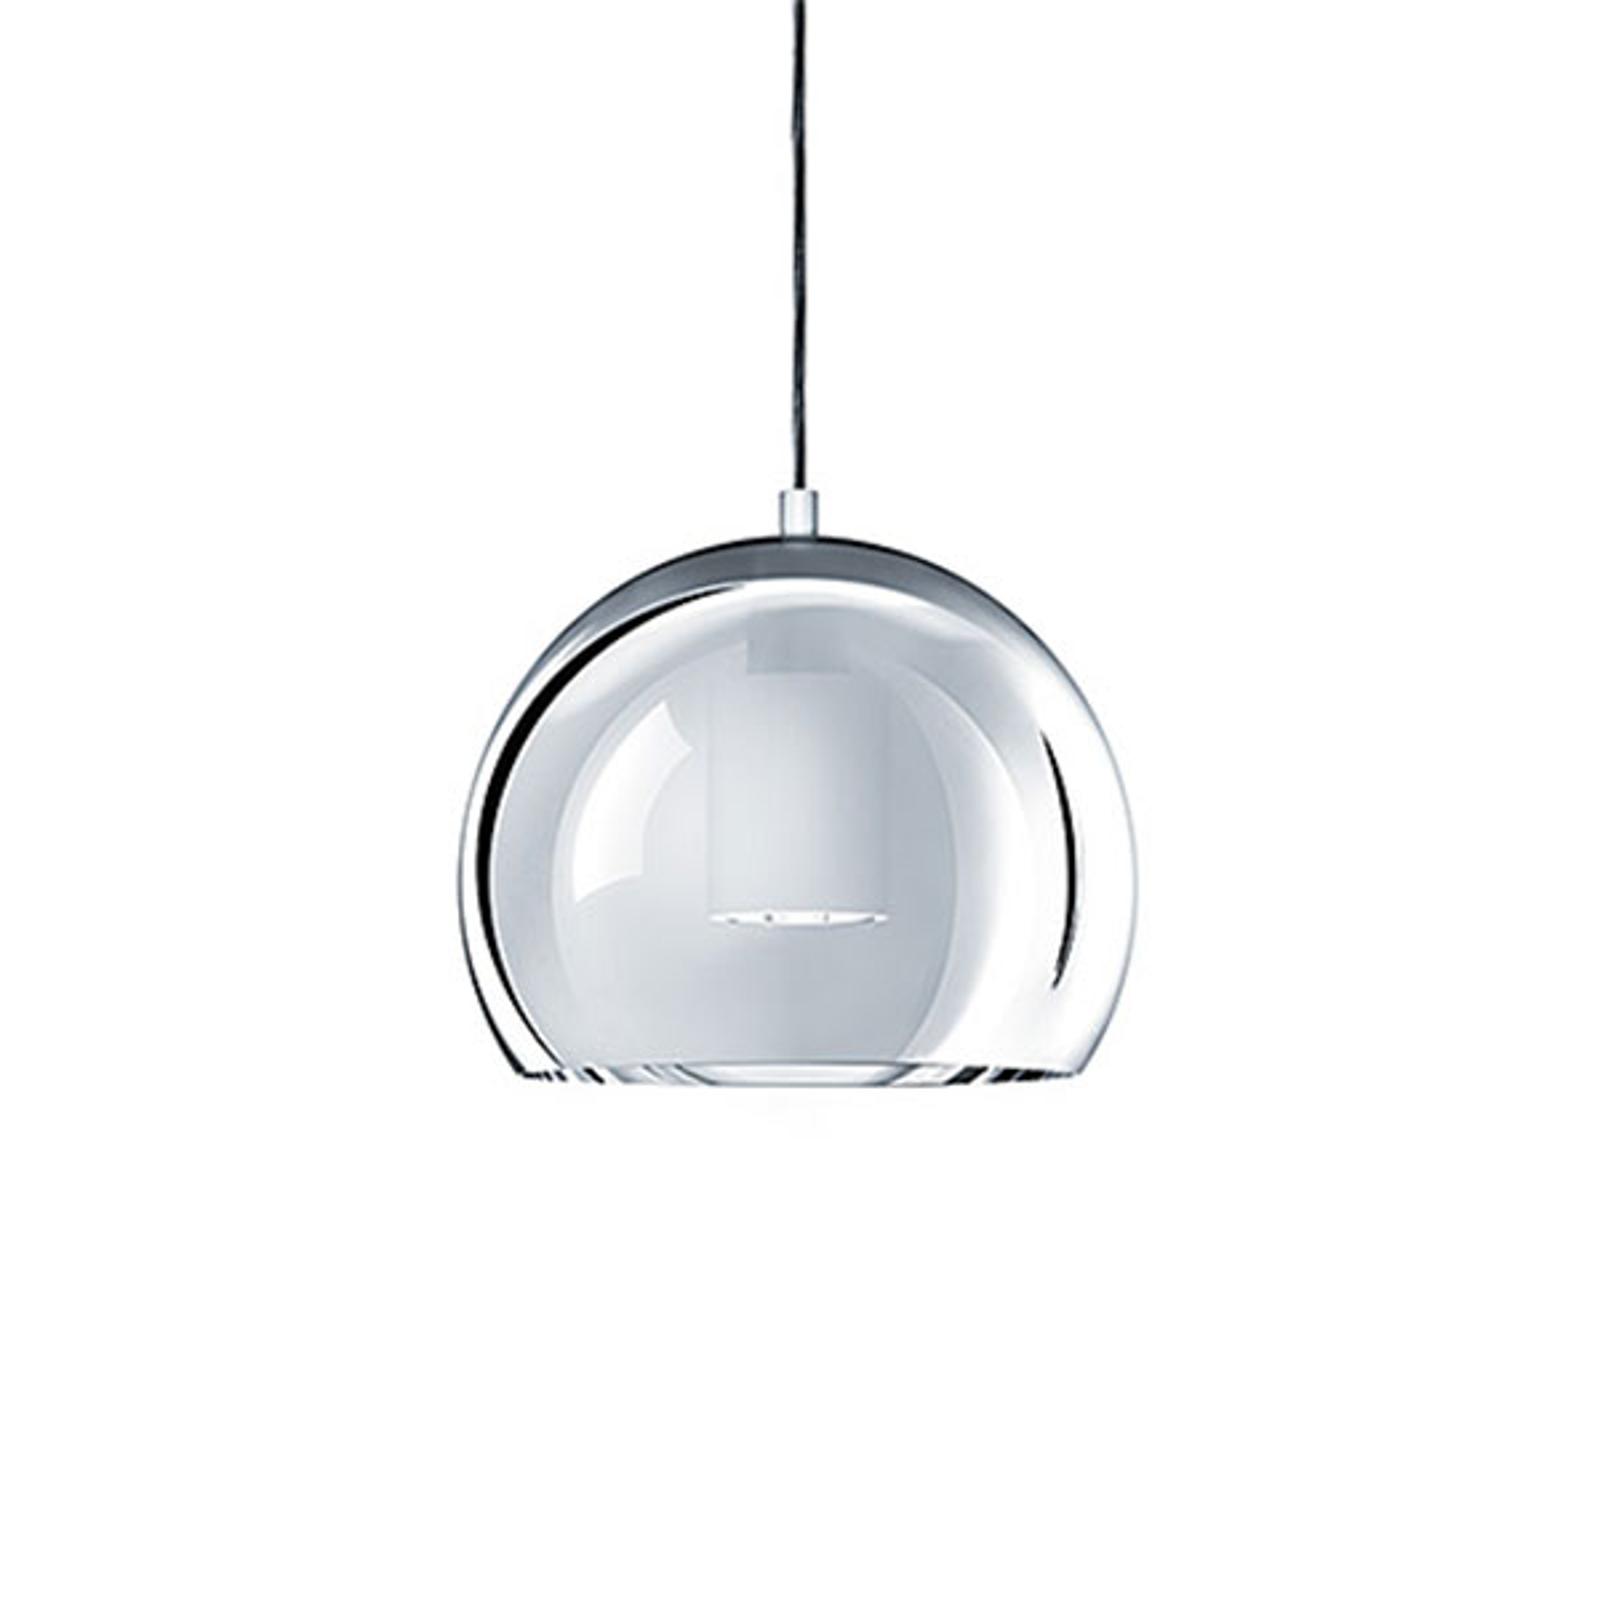 Zumtobel Sconfine Sfera LED-Pendellampe 25cm chrom